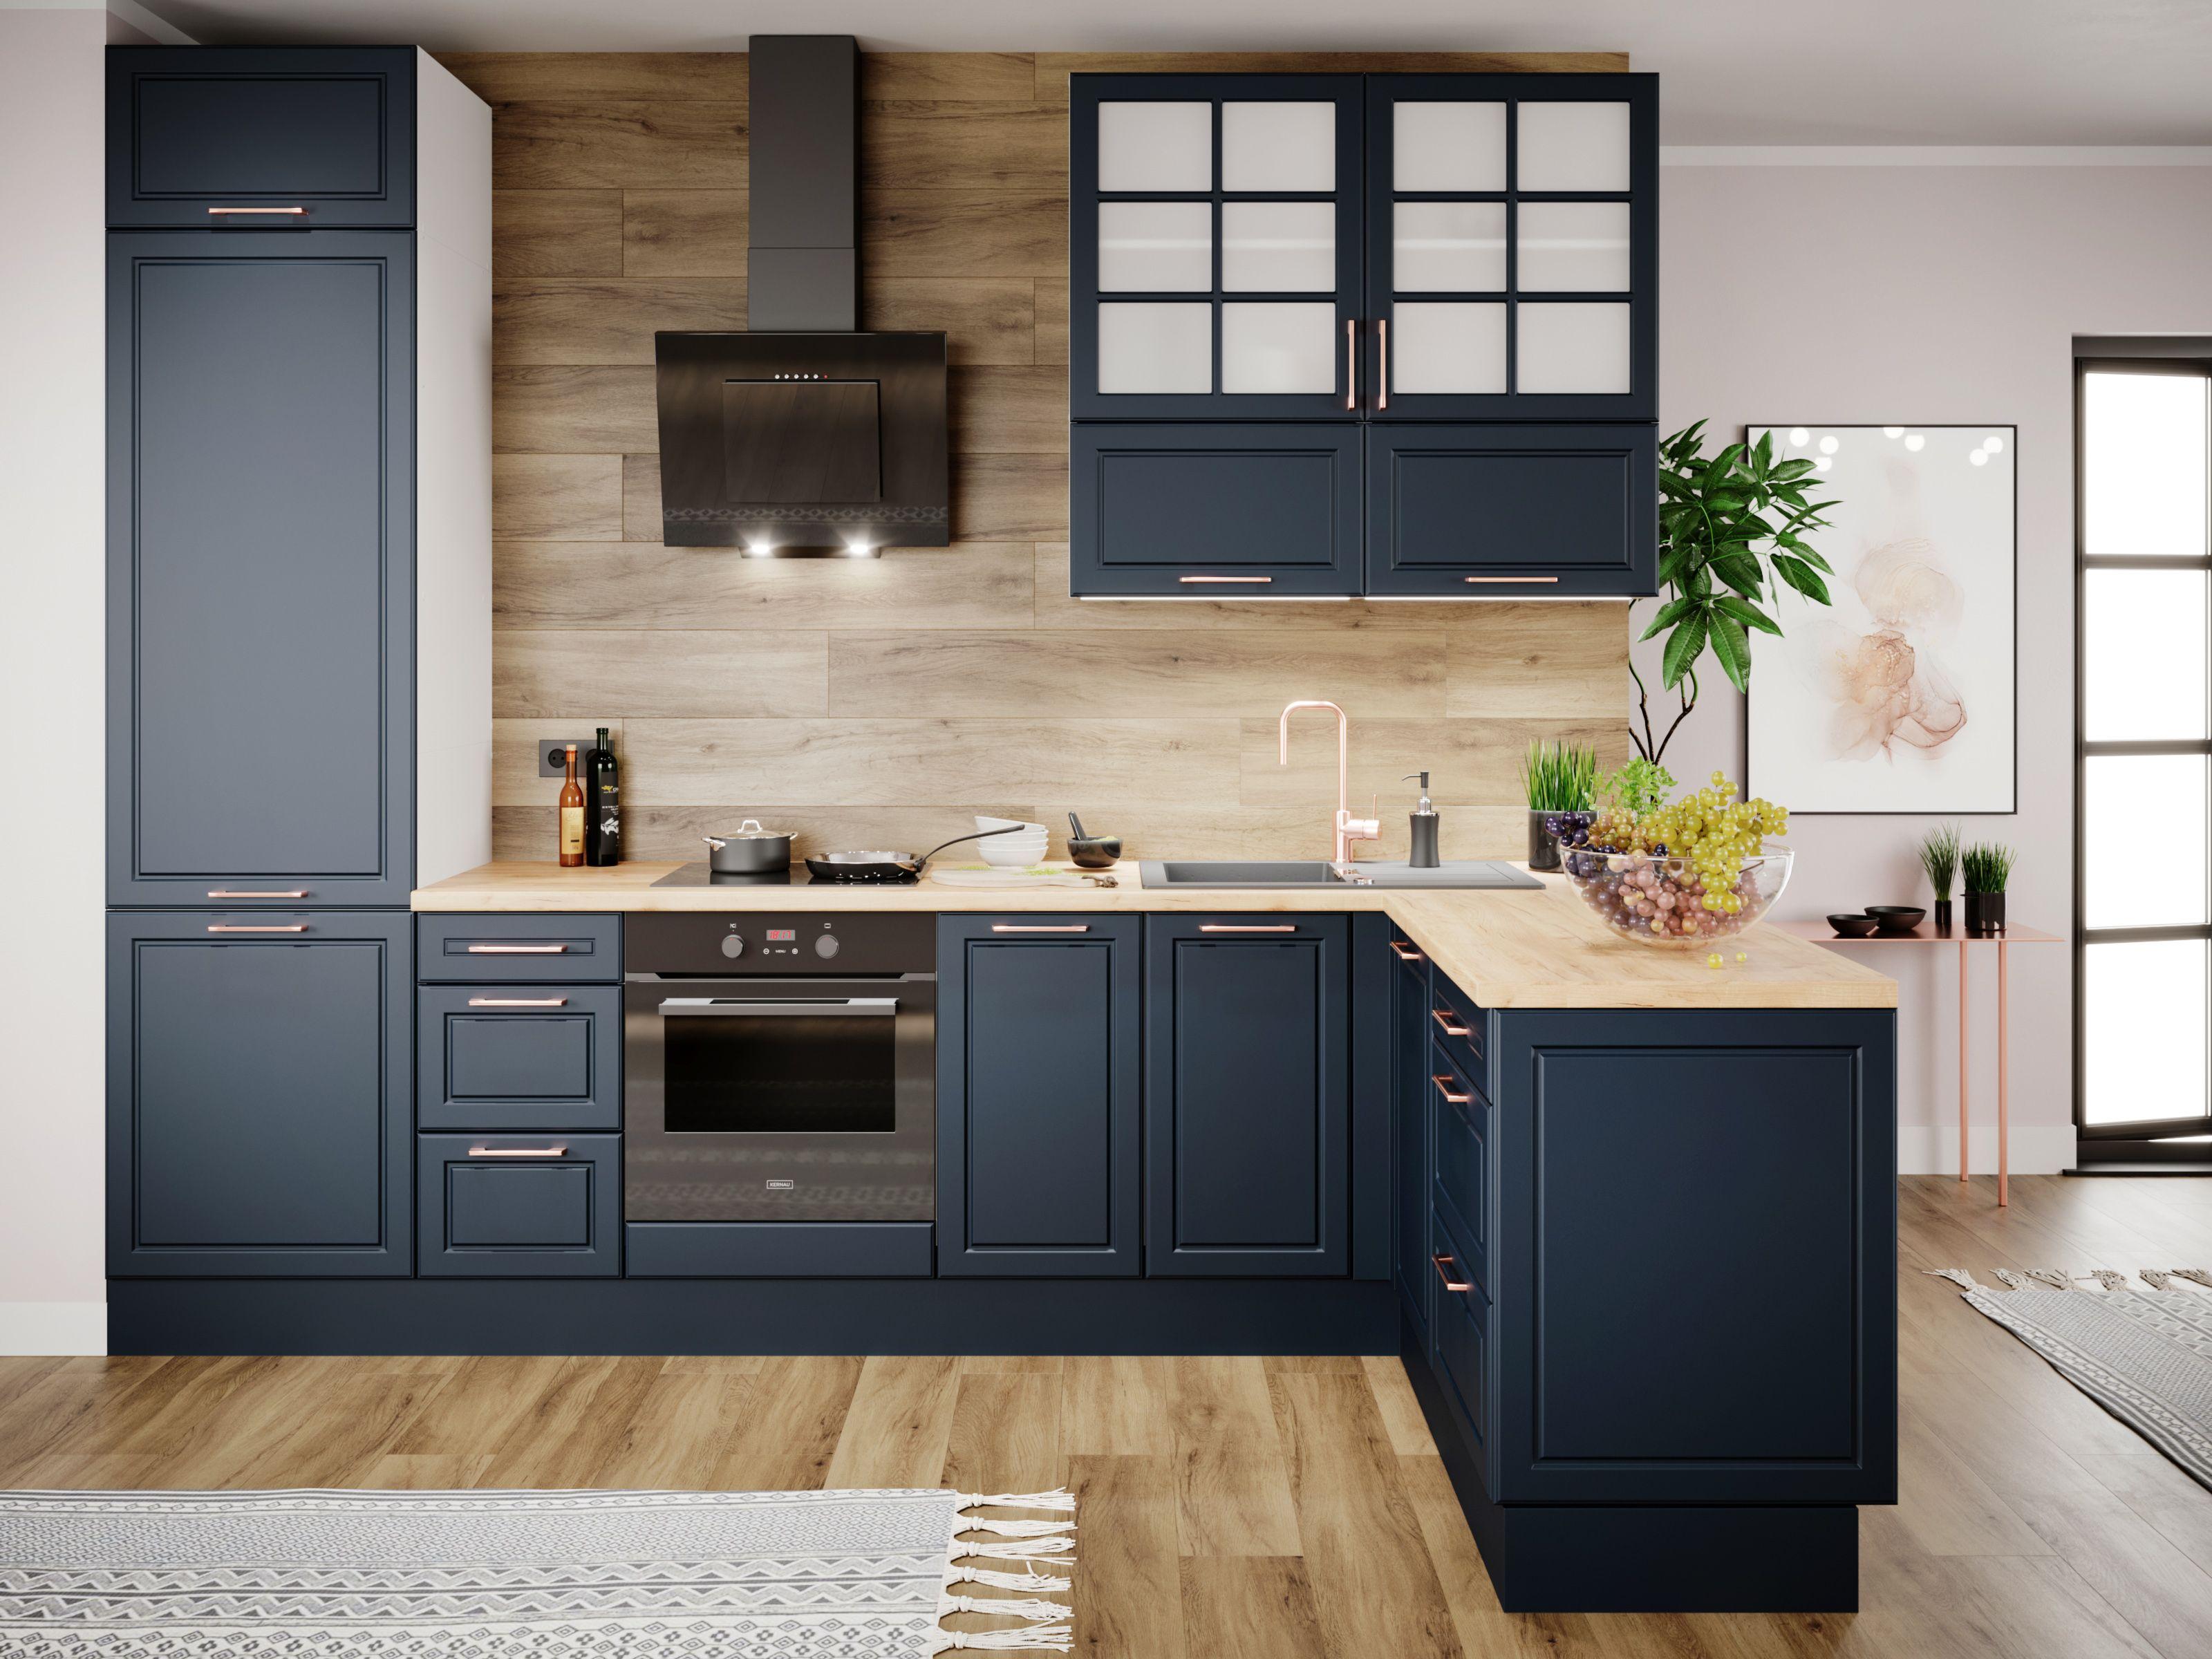 Lupus Eco Modena Indigo Stylish Kitchen Kitchen Design Modern Kitchen